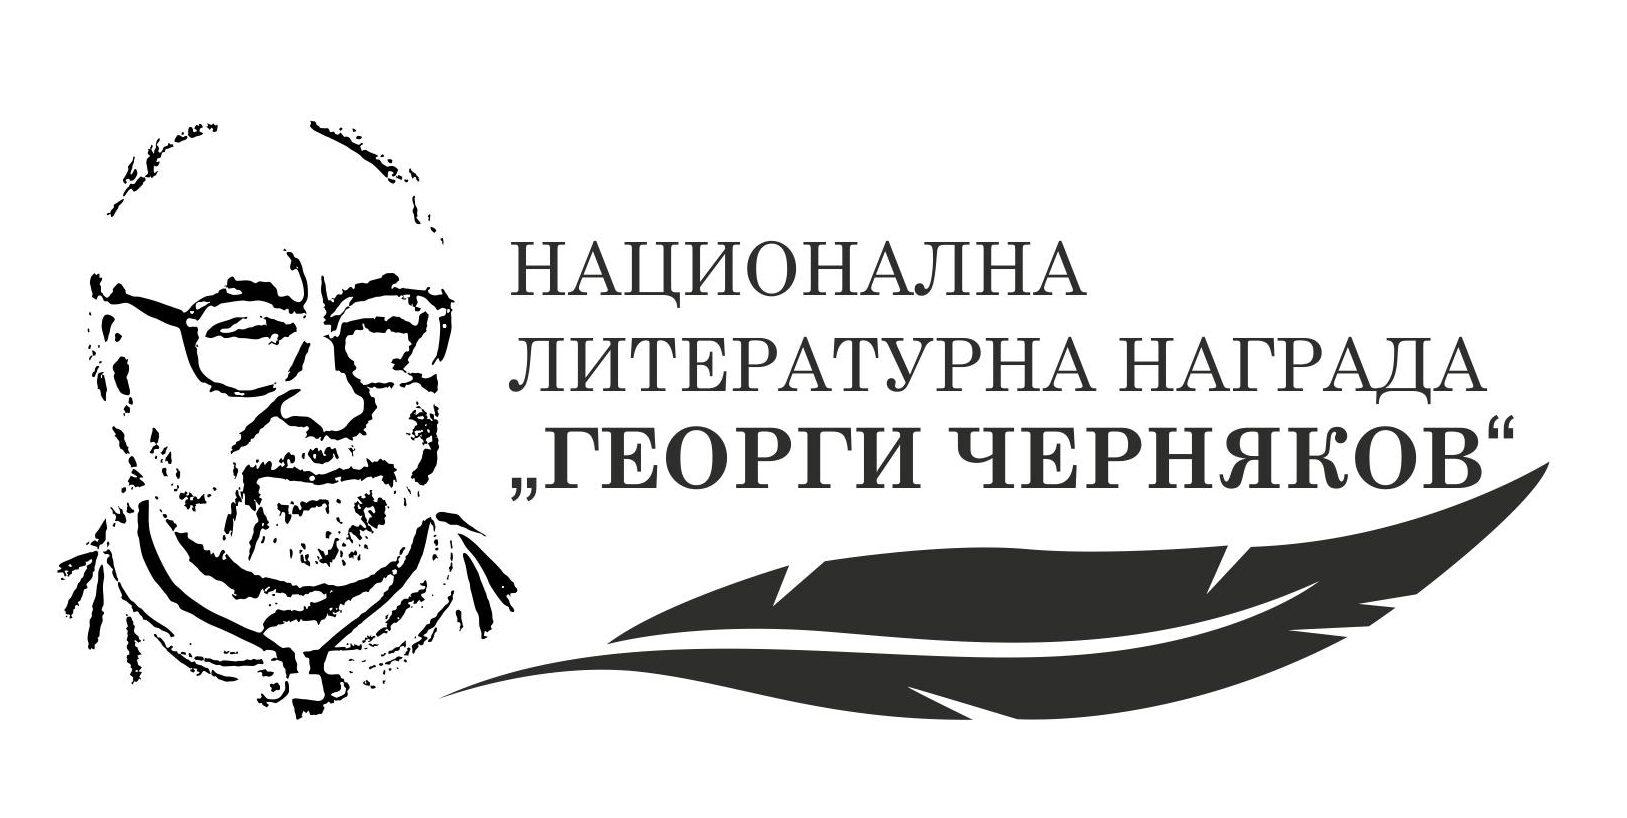 "НАЦИОНАЛНА ЛИТЕРАТУРНА НАГРАДА ""ГЕОРГИ ЧЕРНЯКОВ"" 2020 – Конкурс за студенти – литературни творци"